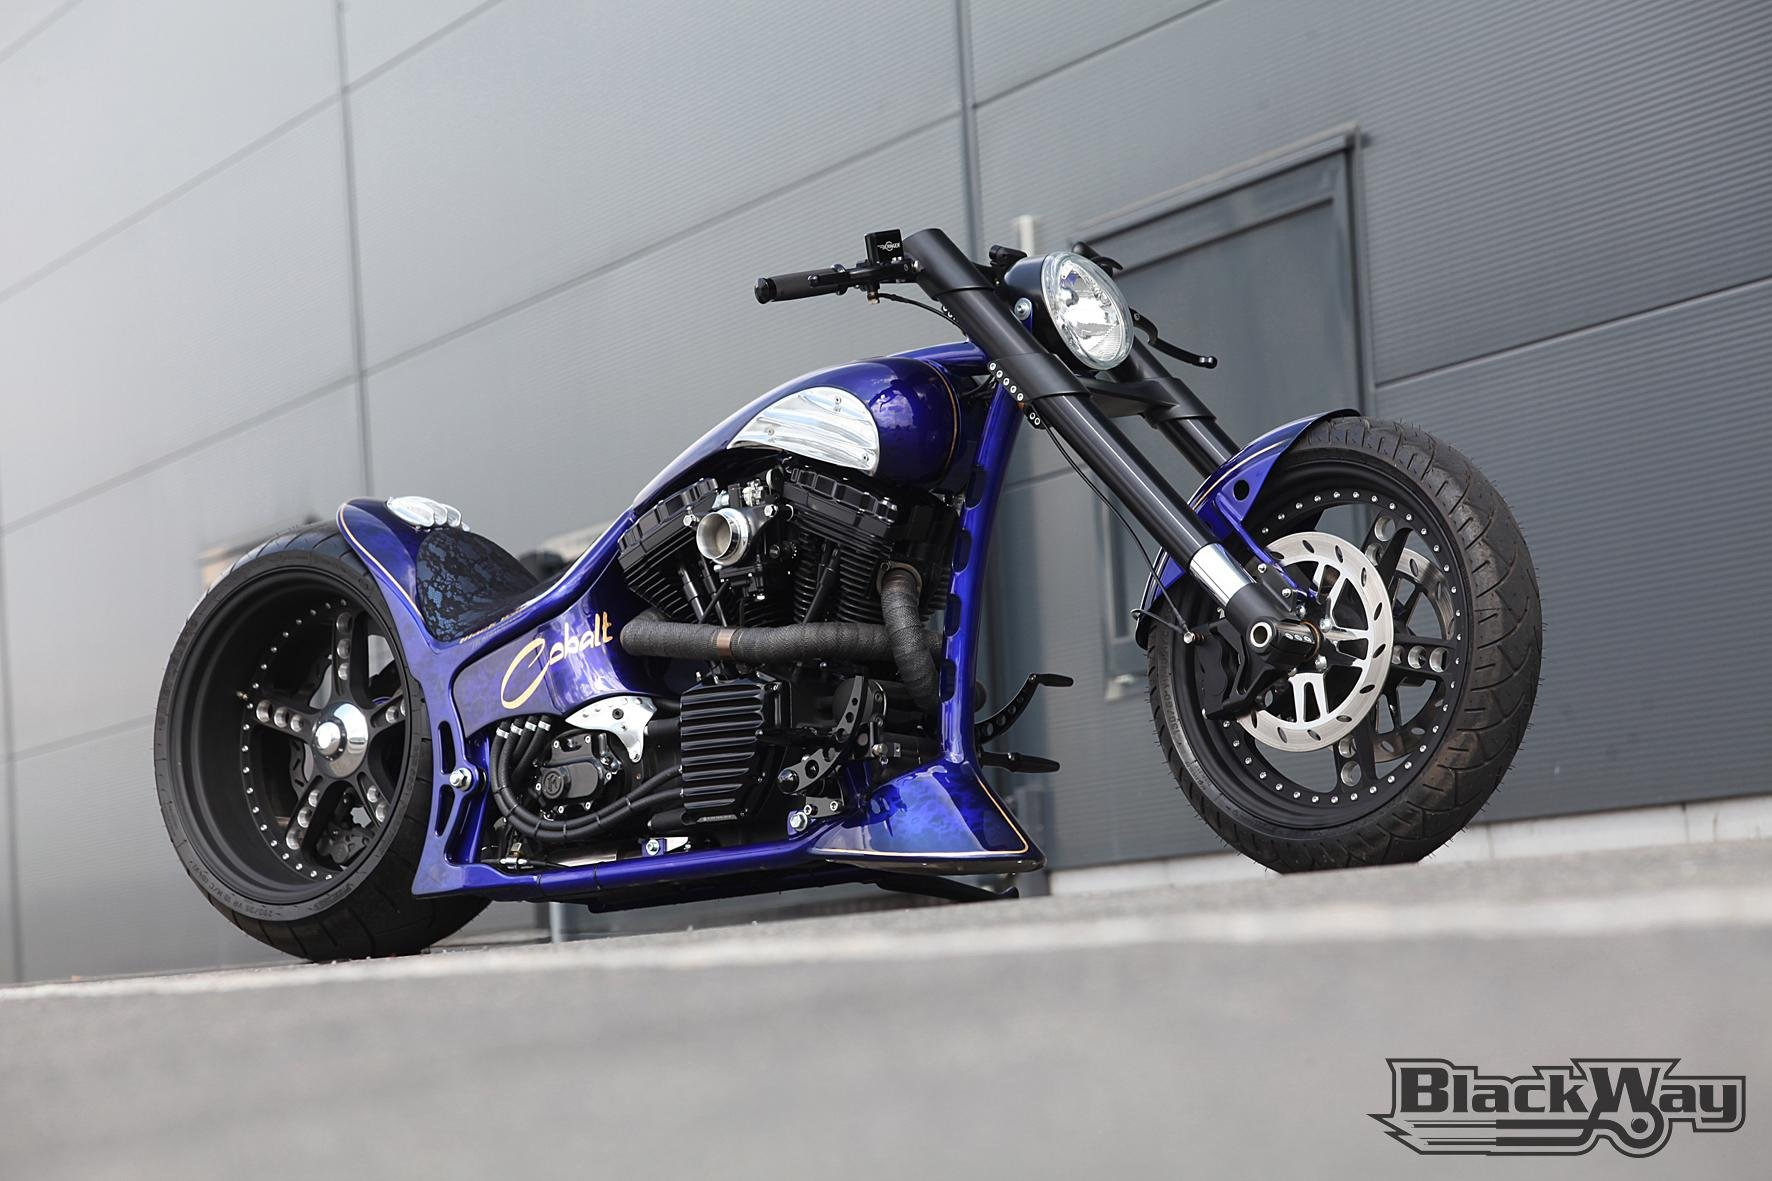 Hardcore Motorcycle 13